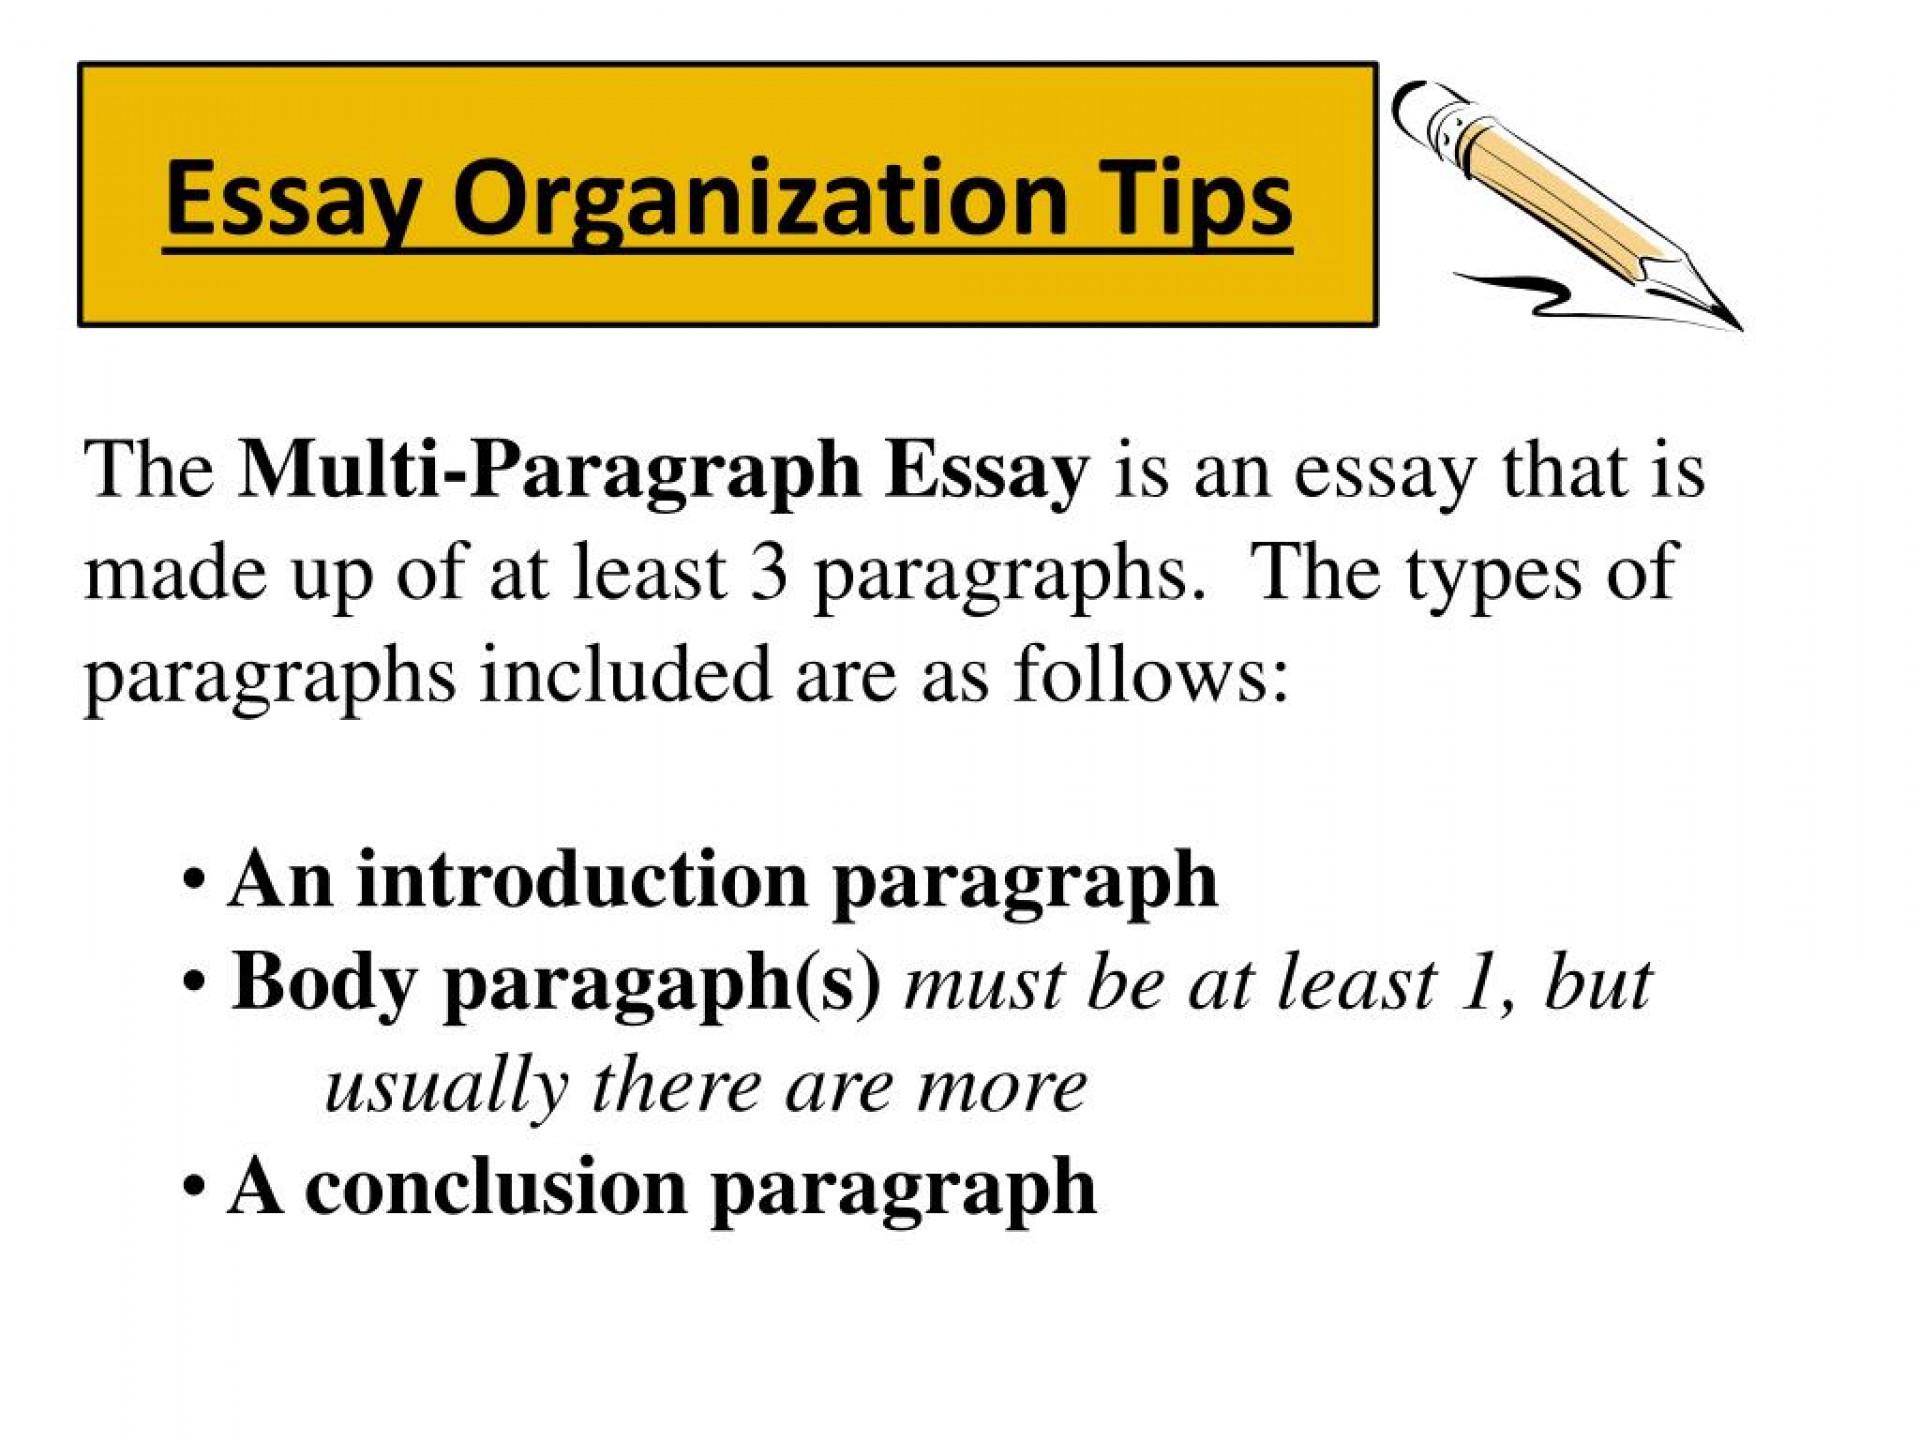 005 Essay Organization Tips L Multi Paragraph Best Graphic Organizer Example Format 1920